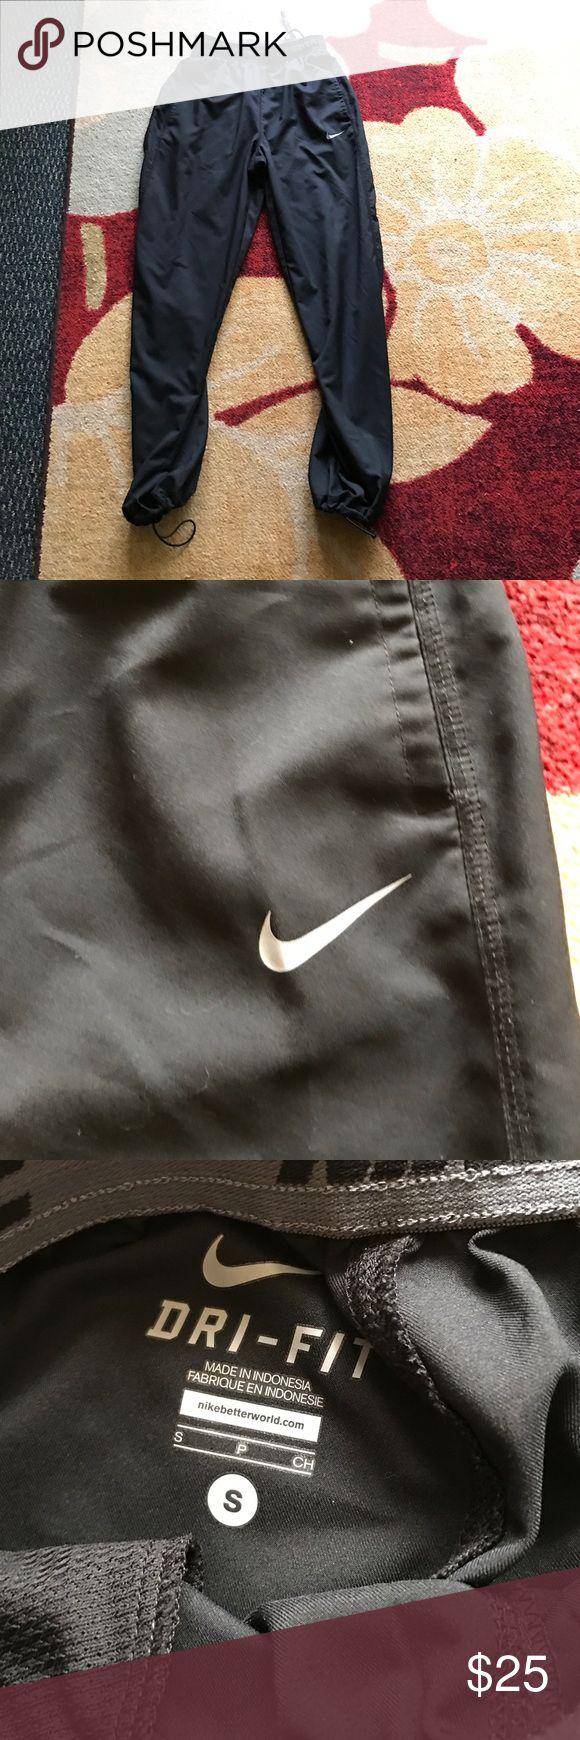 Black nike dri-fit sweat pants Black nike dri-fit Nike sweatpants Nike Pants Sweatpants & Joggers